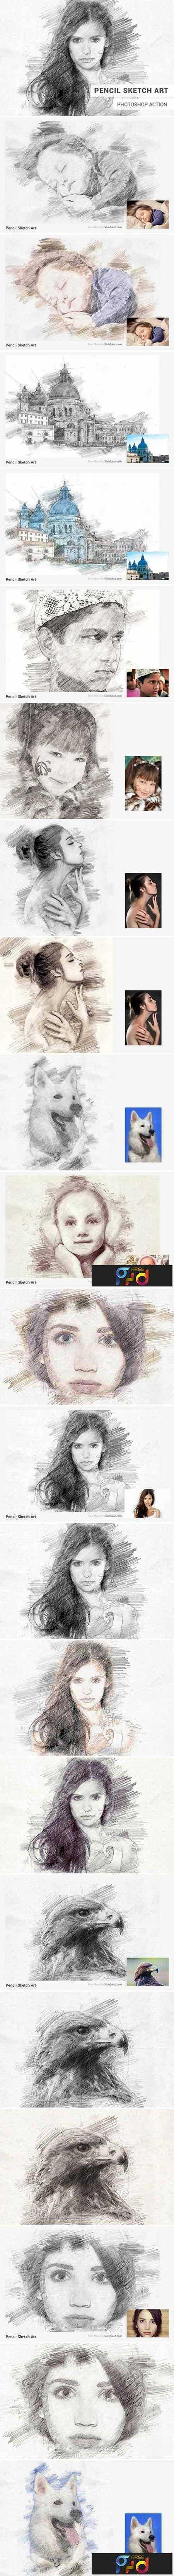 1706149 pencil sketch art photoshop action 1821521 1